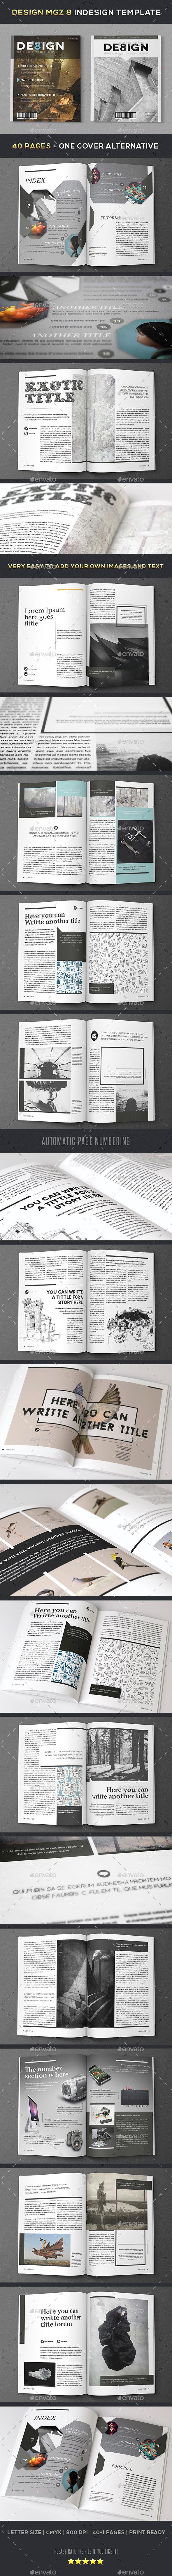 Design Magazine 8 Indesign Template - Magazines Print Templates